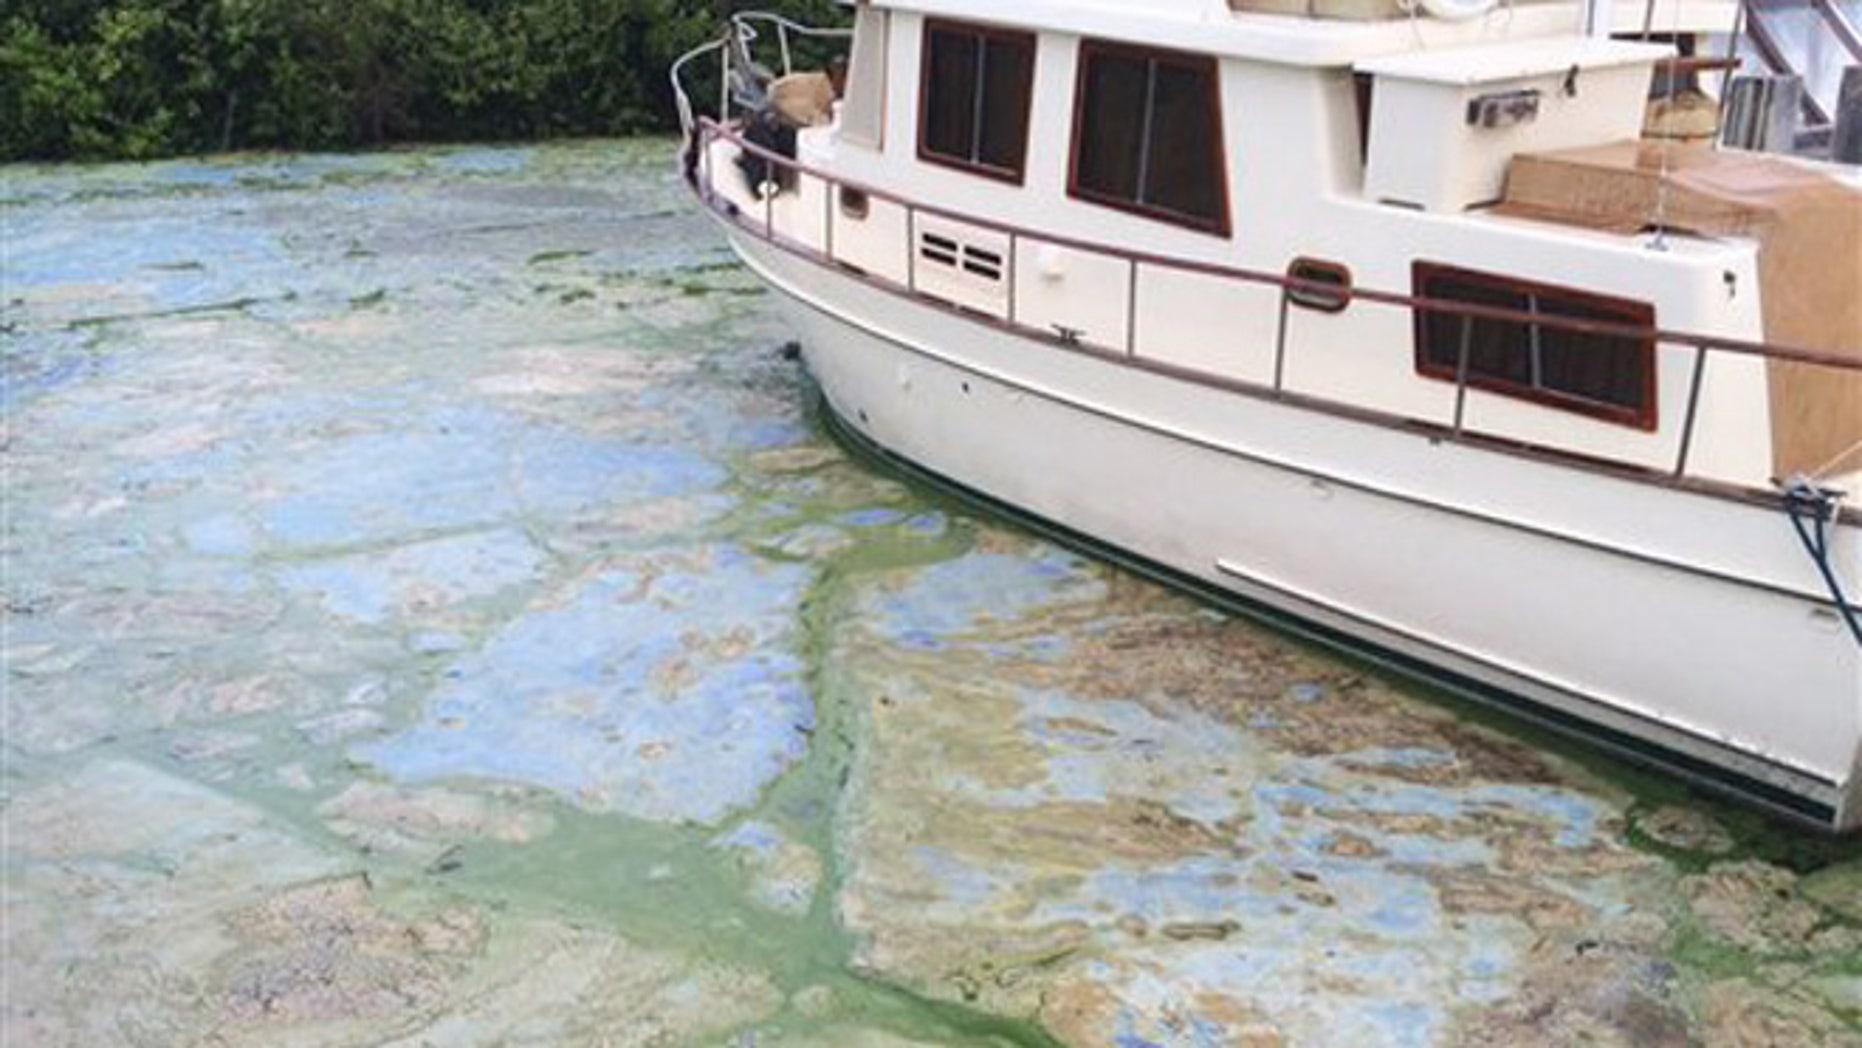 Algae covered water at Stuart's Central Marine boat docks is thick, Thursday, June 30, 2016, in Stuart, Fla.